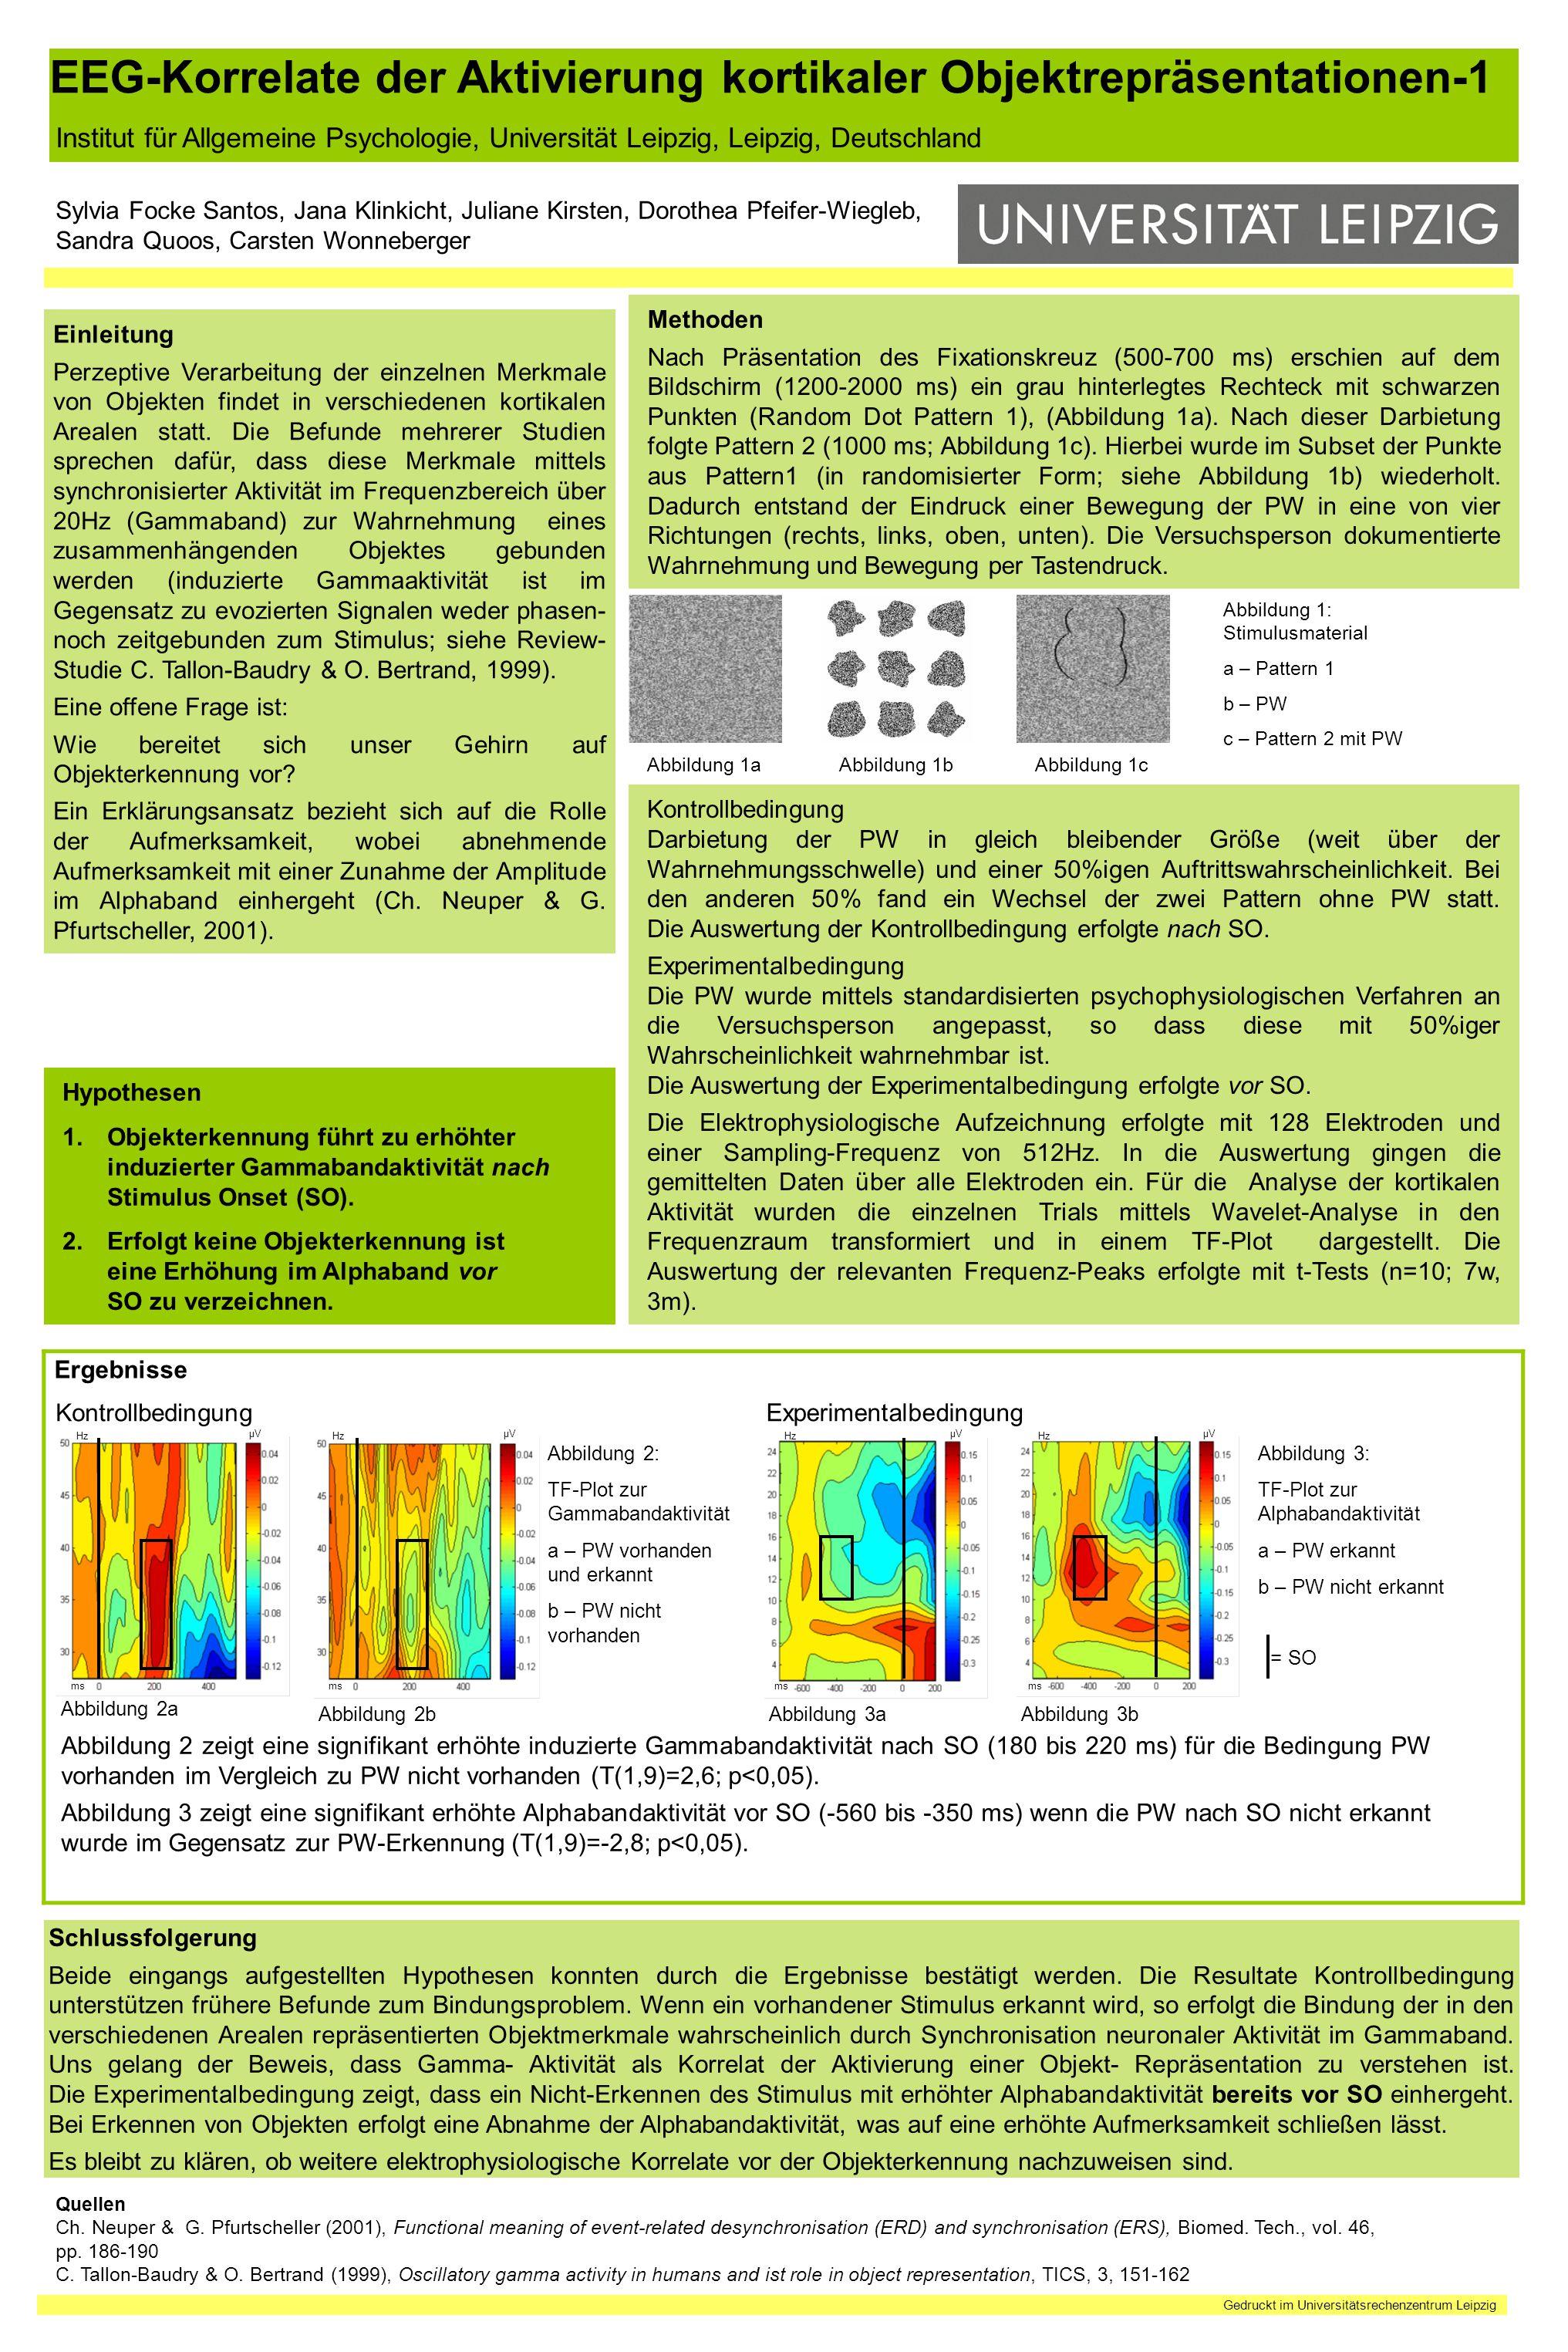 EEG-Korrelate der Aktivierung kortikaler Objektrepräsentationen-1